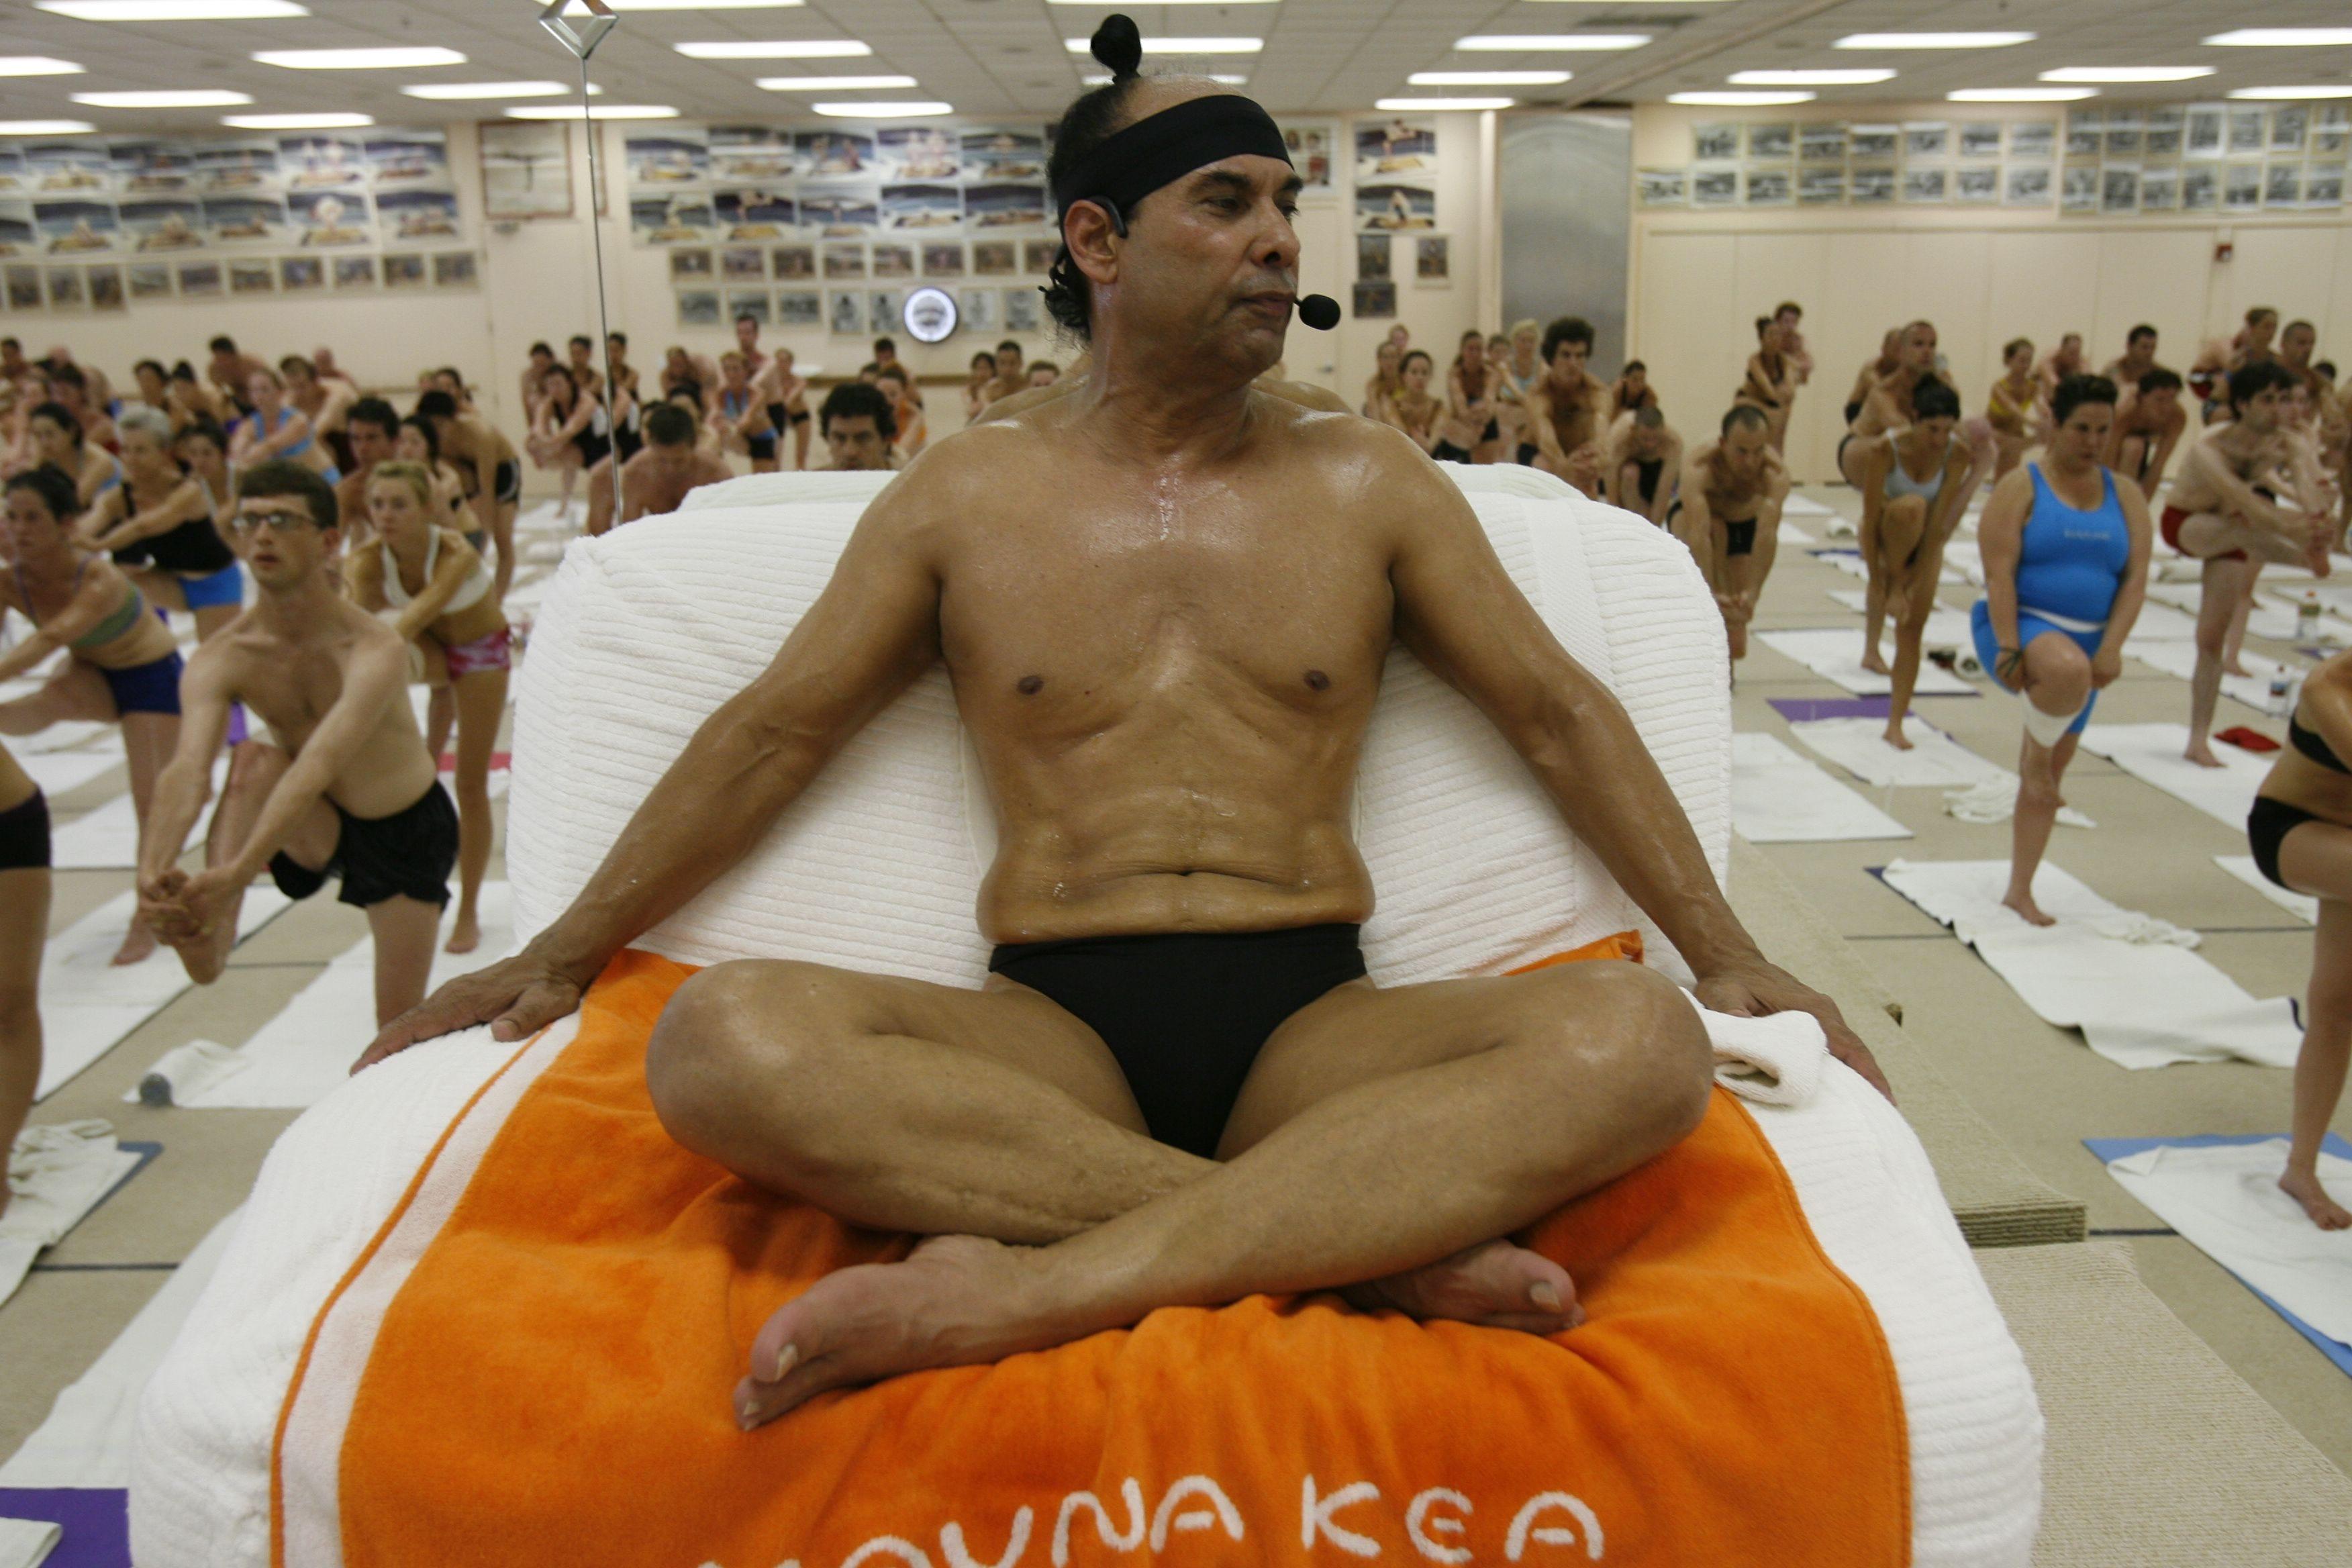 Calif Judge Issues Arrest Warrant For Hot Yoga Founder Bikram Choudhury Arizona News Newslocker